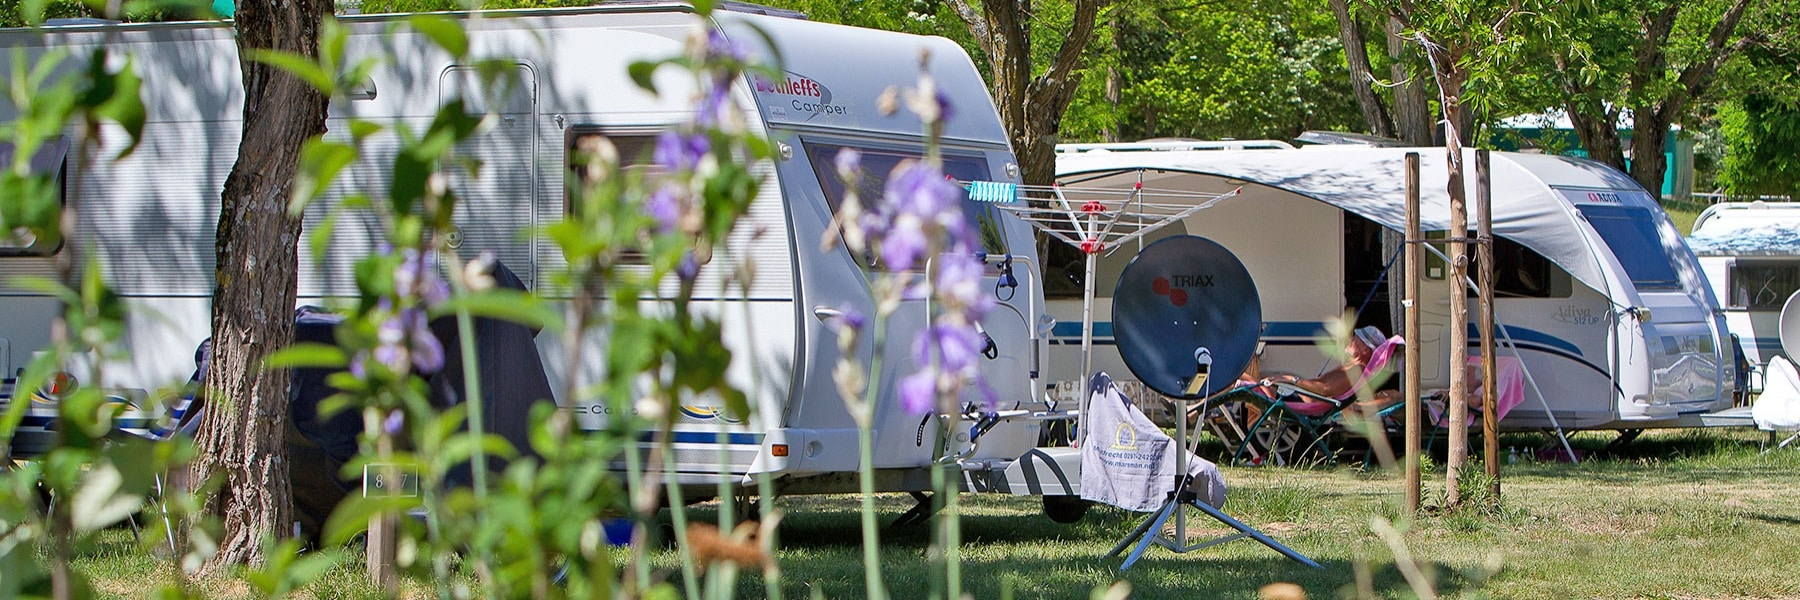 Clubs : groups of caravans and campervans